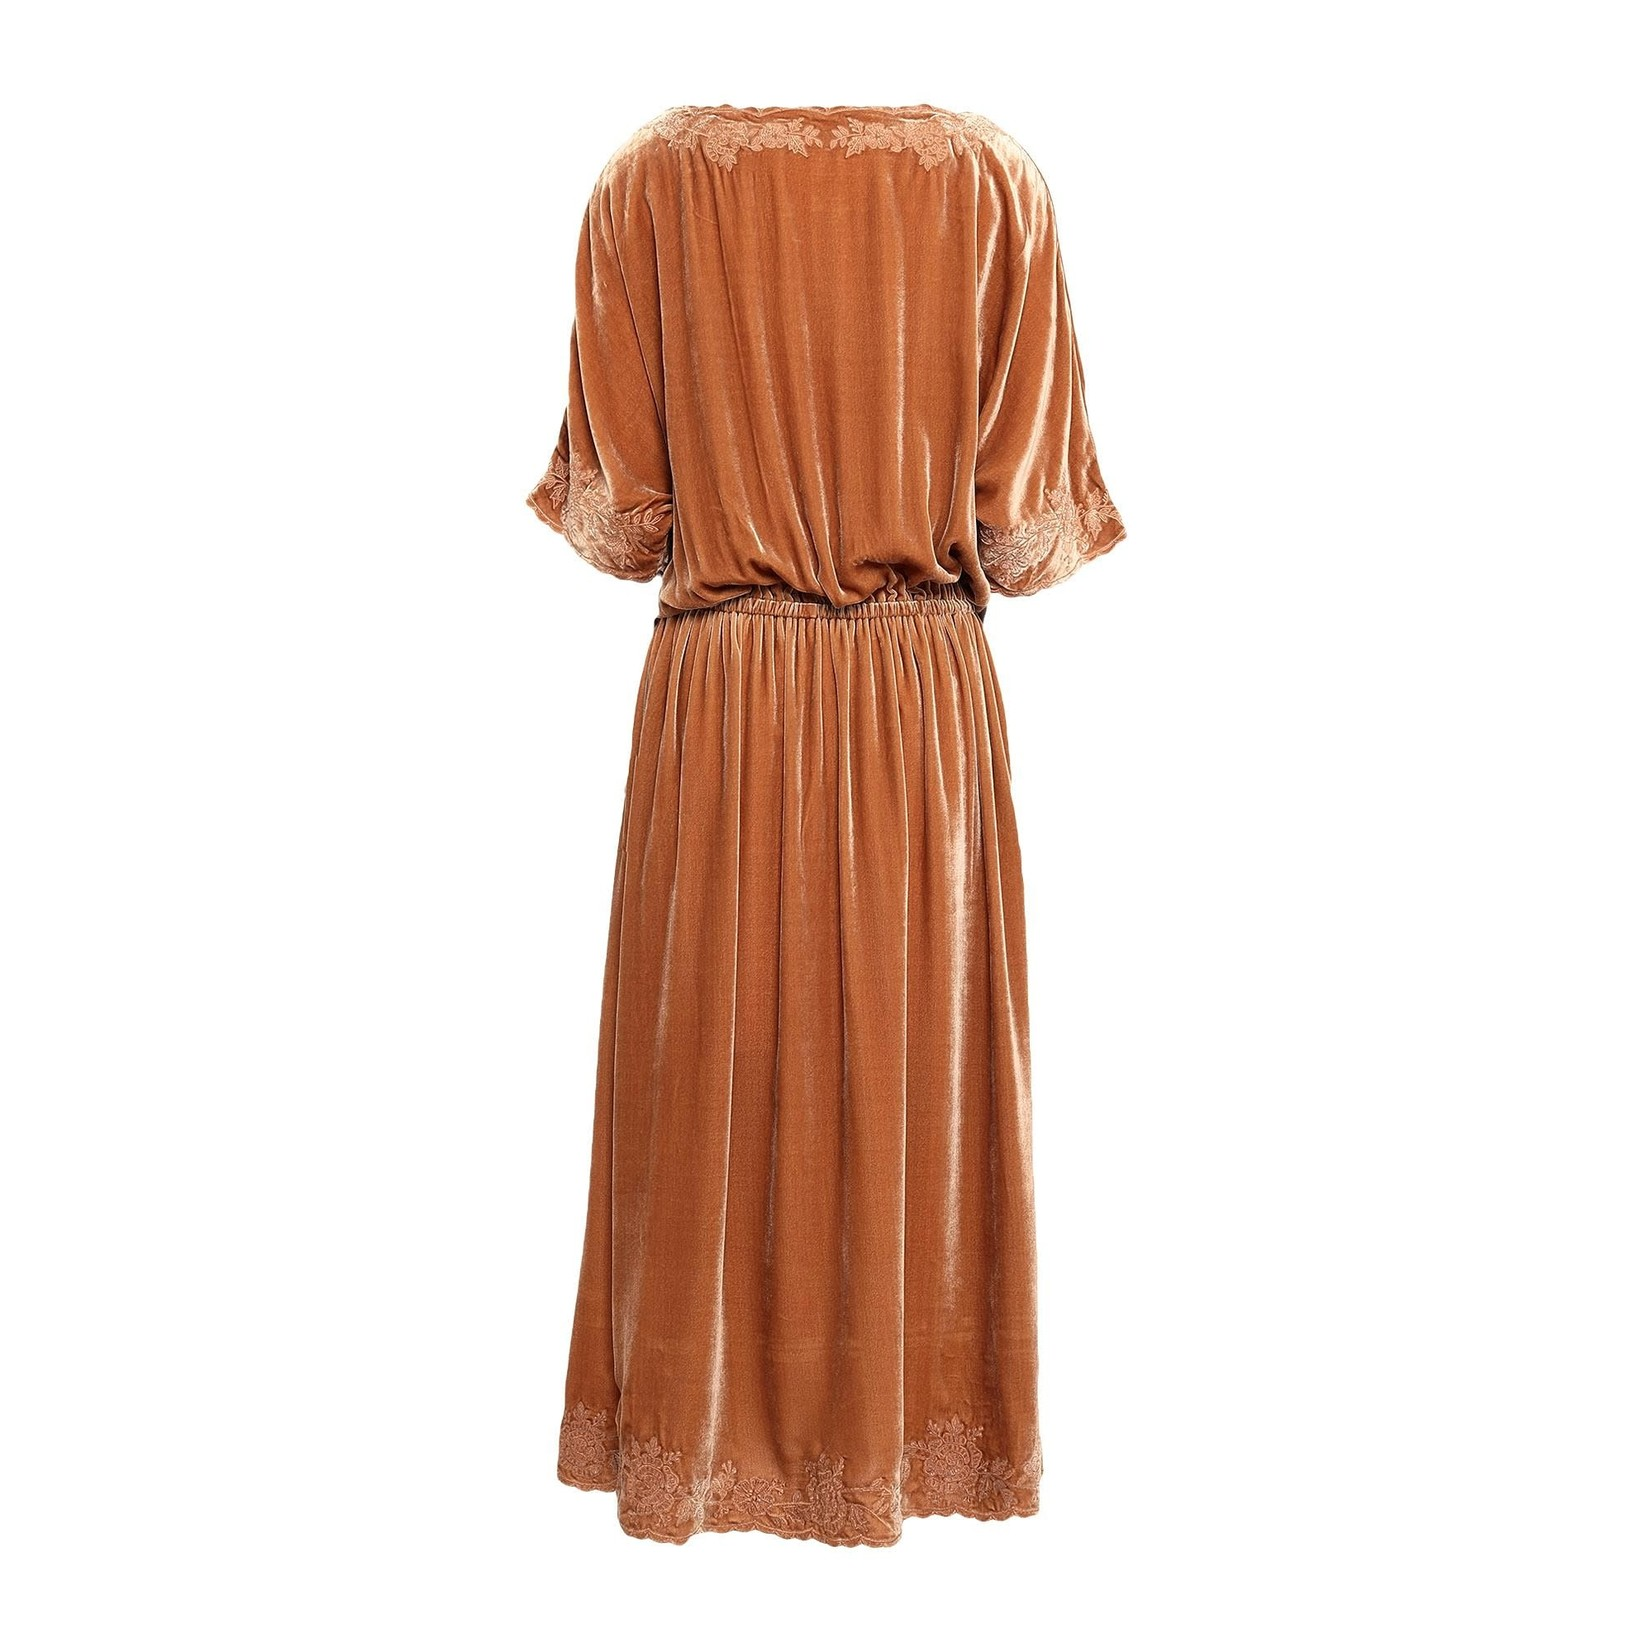 Mes Demoiselles May Dress